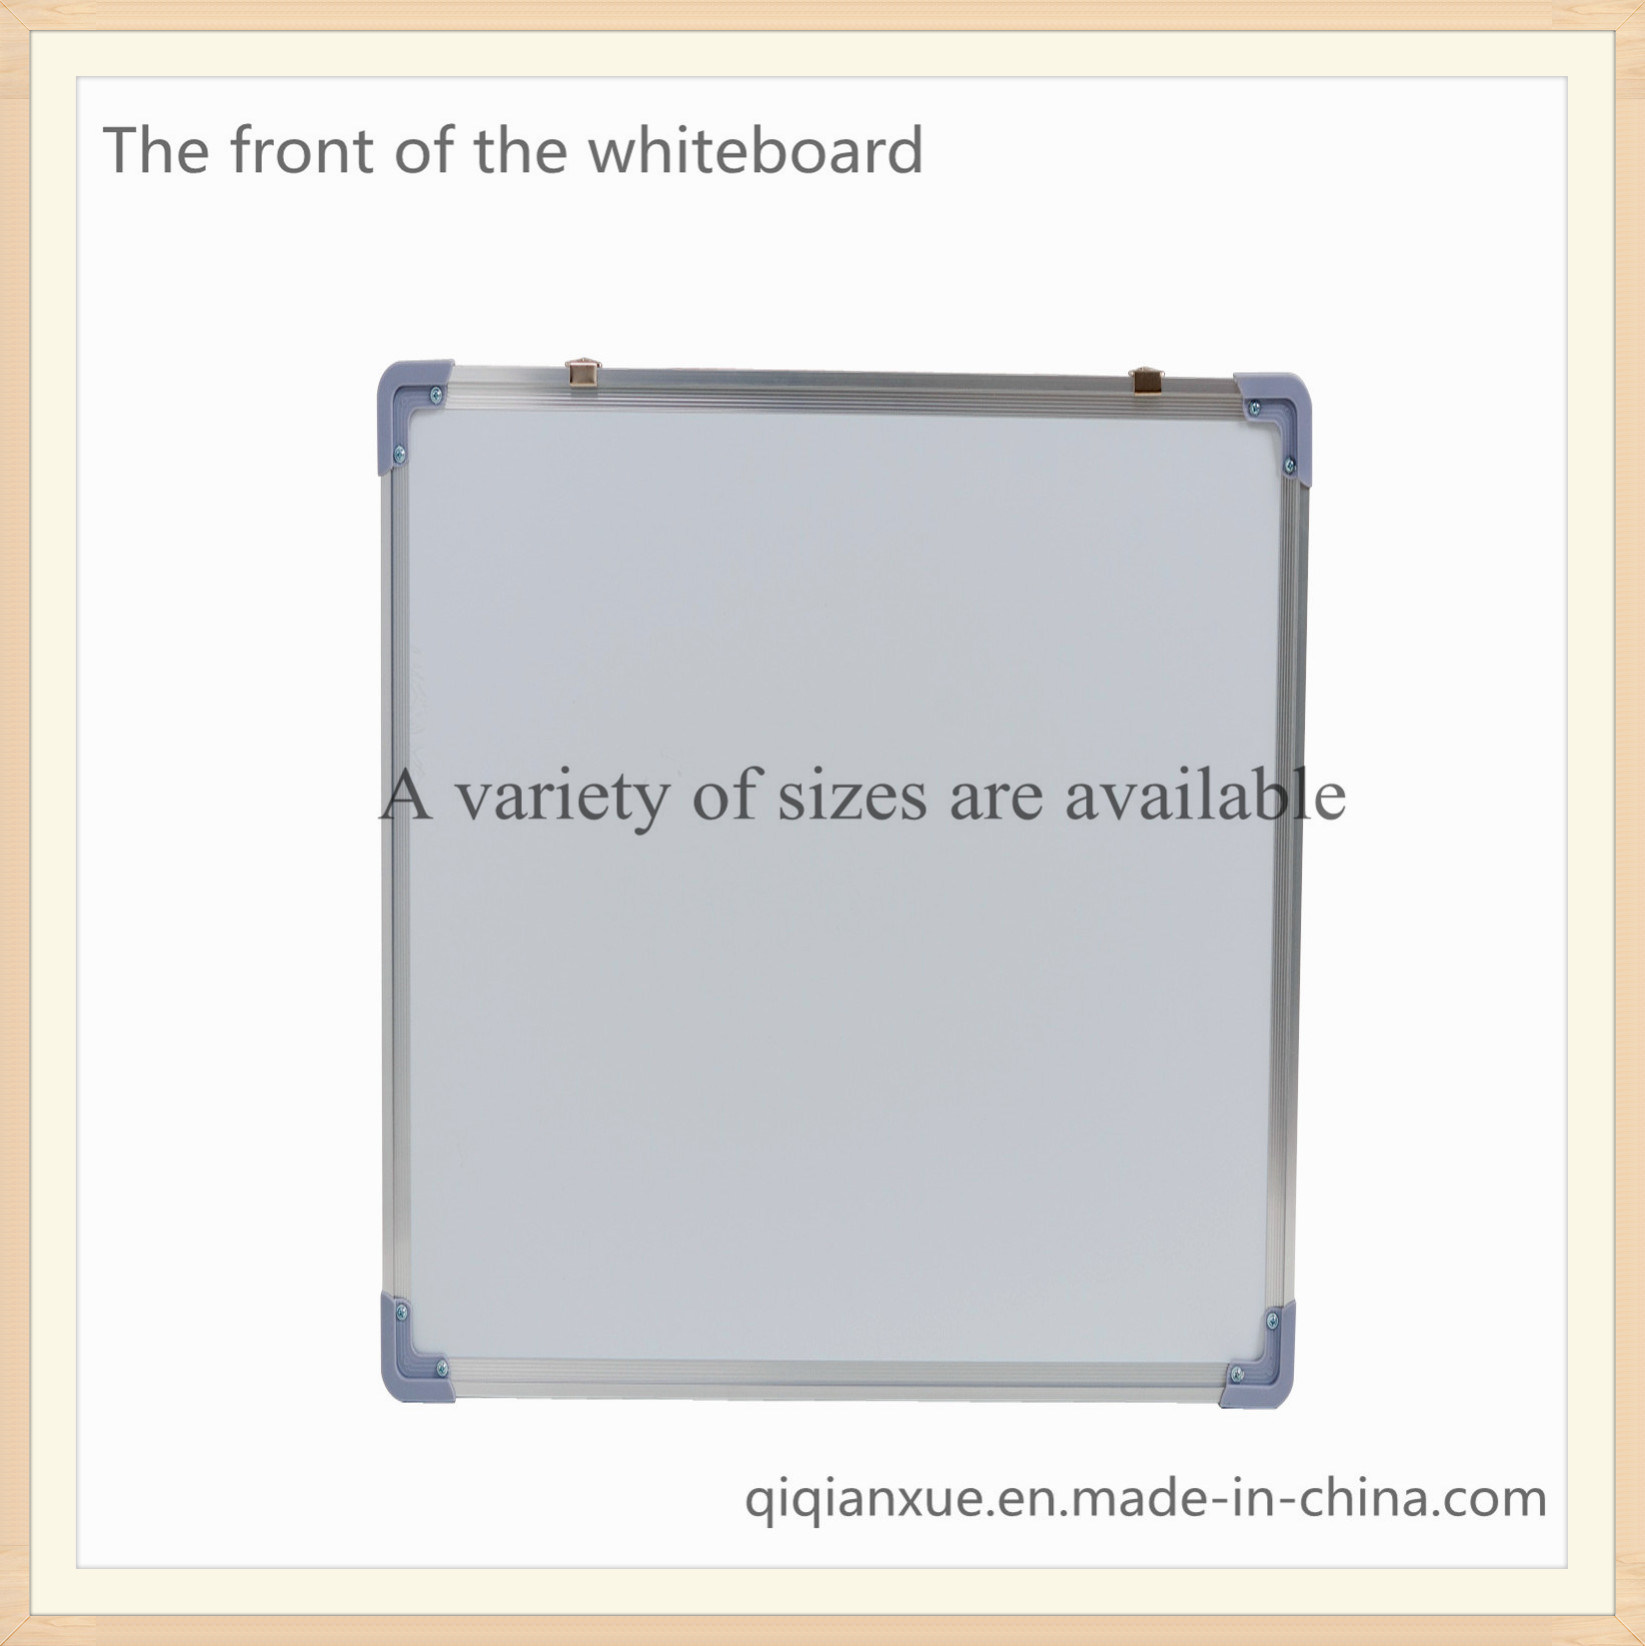 China Plastic&Nbsp; Sheet&Nbsp; White&Nbsp; Board - China Furniture ...